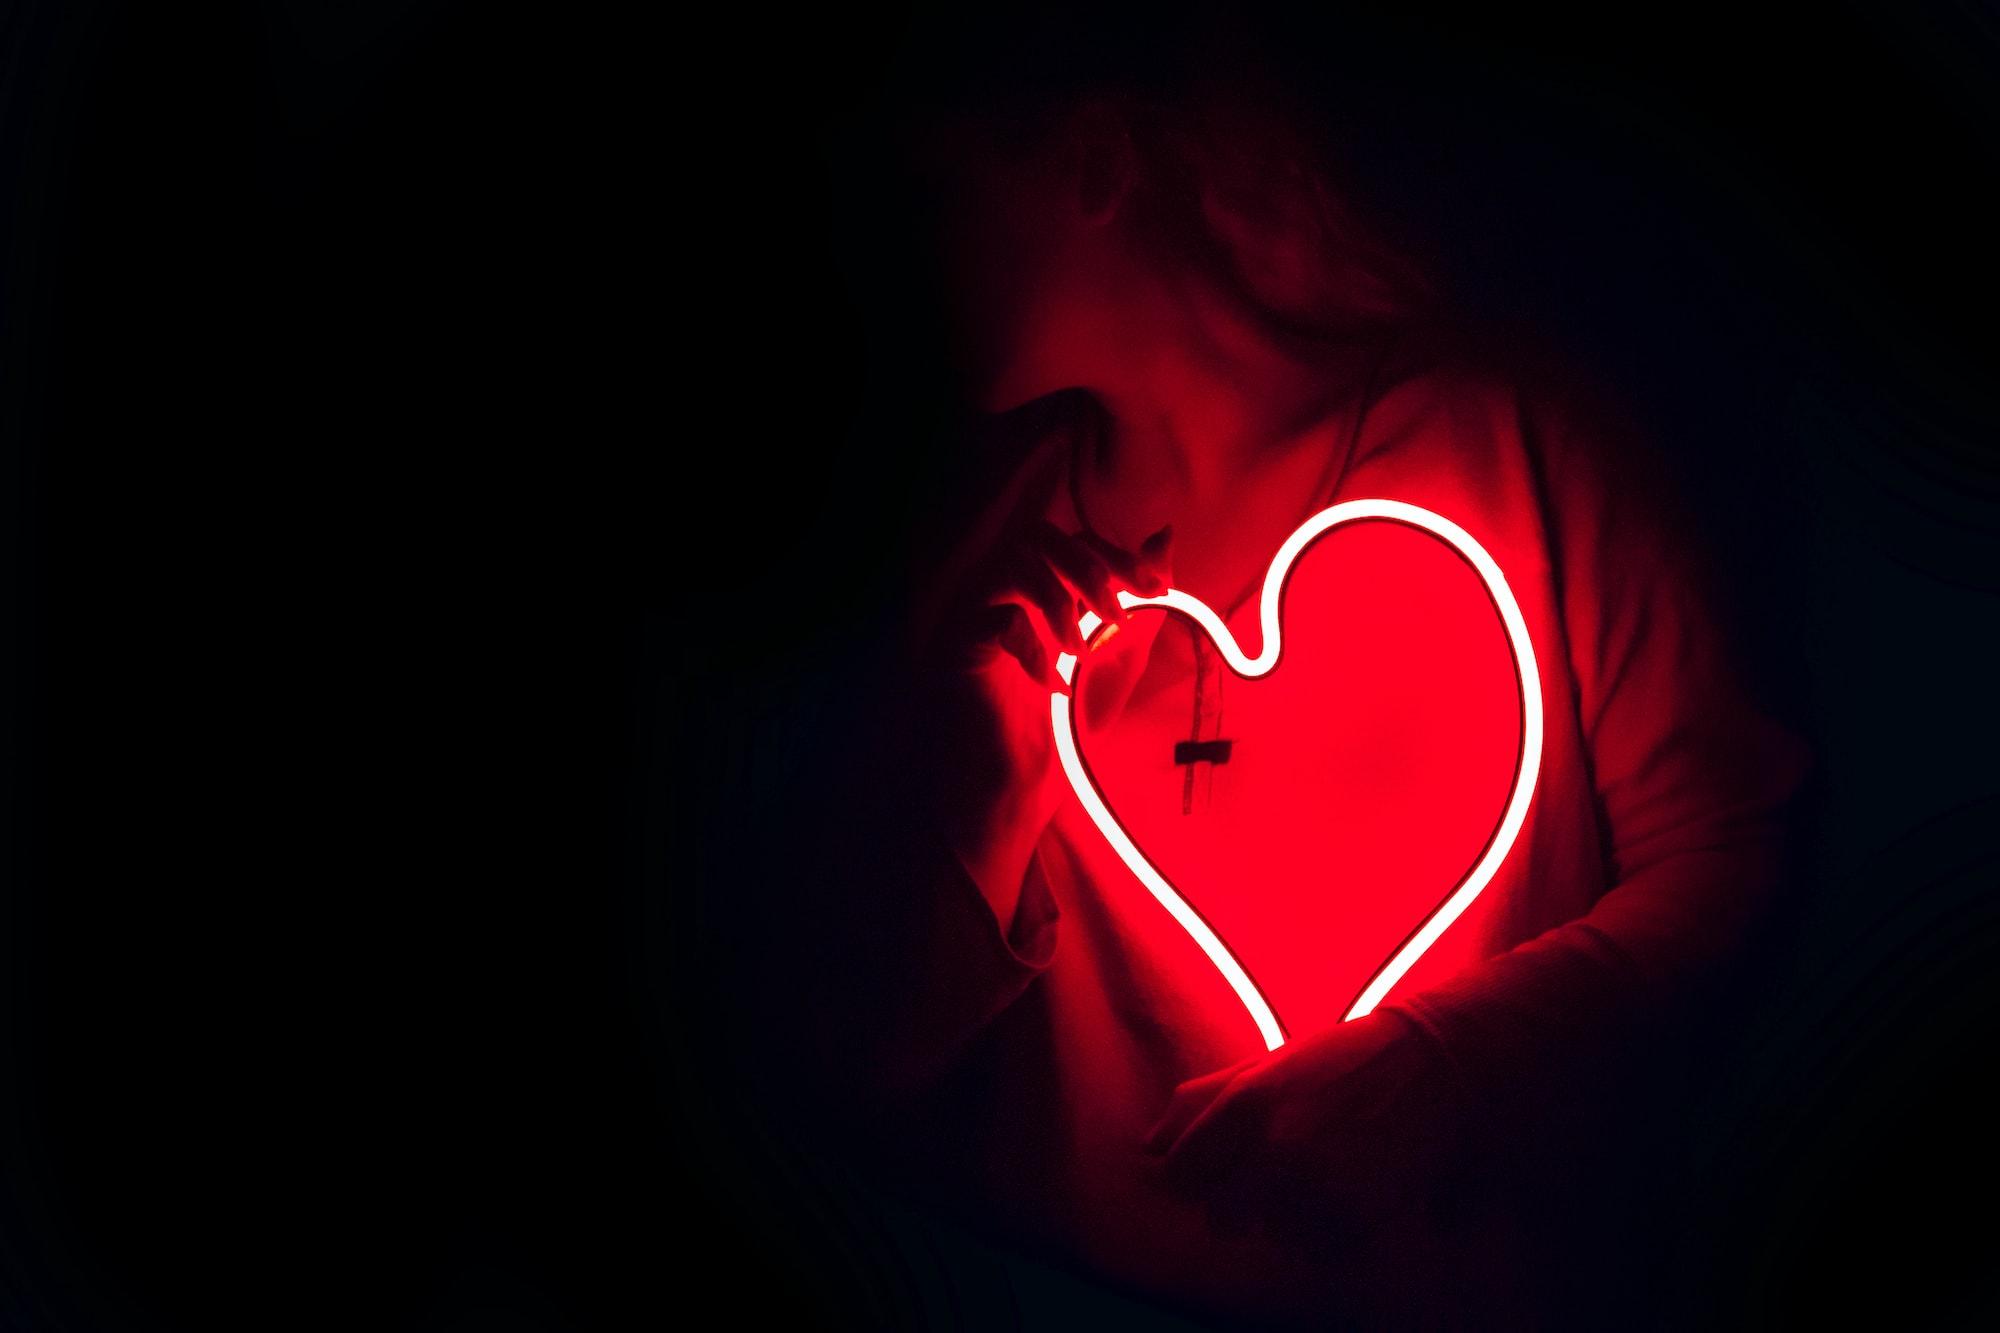 Netflix, Twitter, & Robinhood investor, IVP, leads round in Israeli MedTech startup Hello Heart